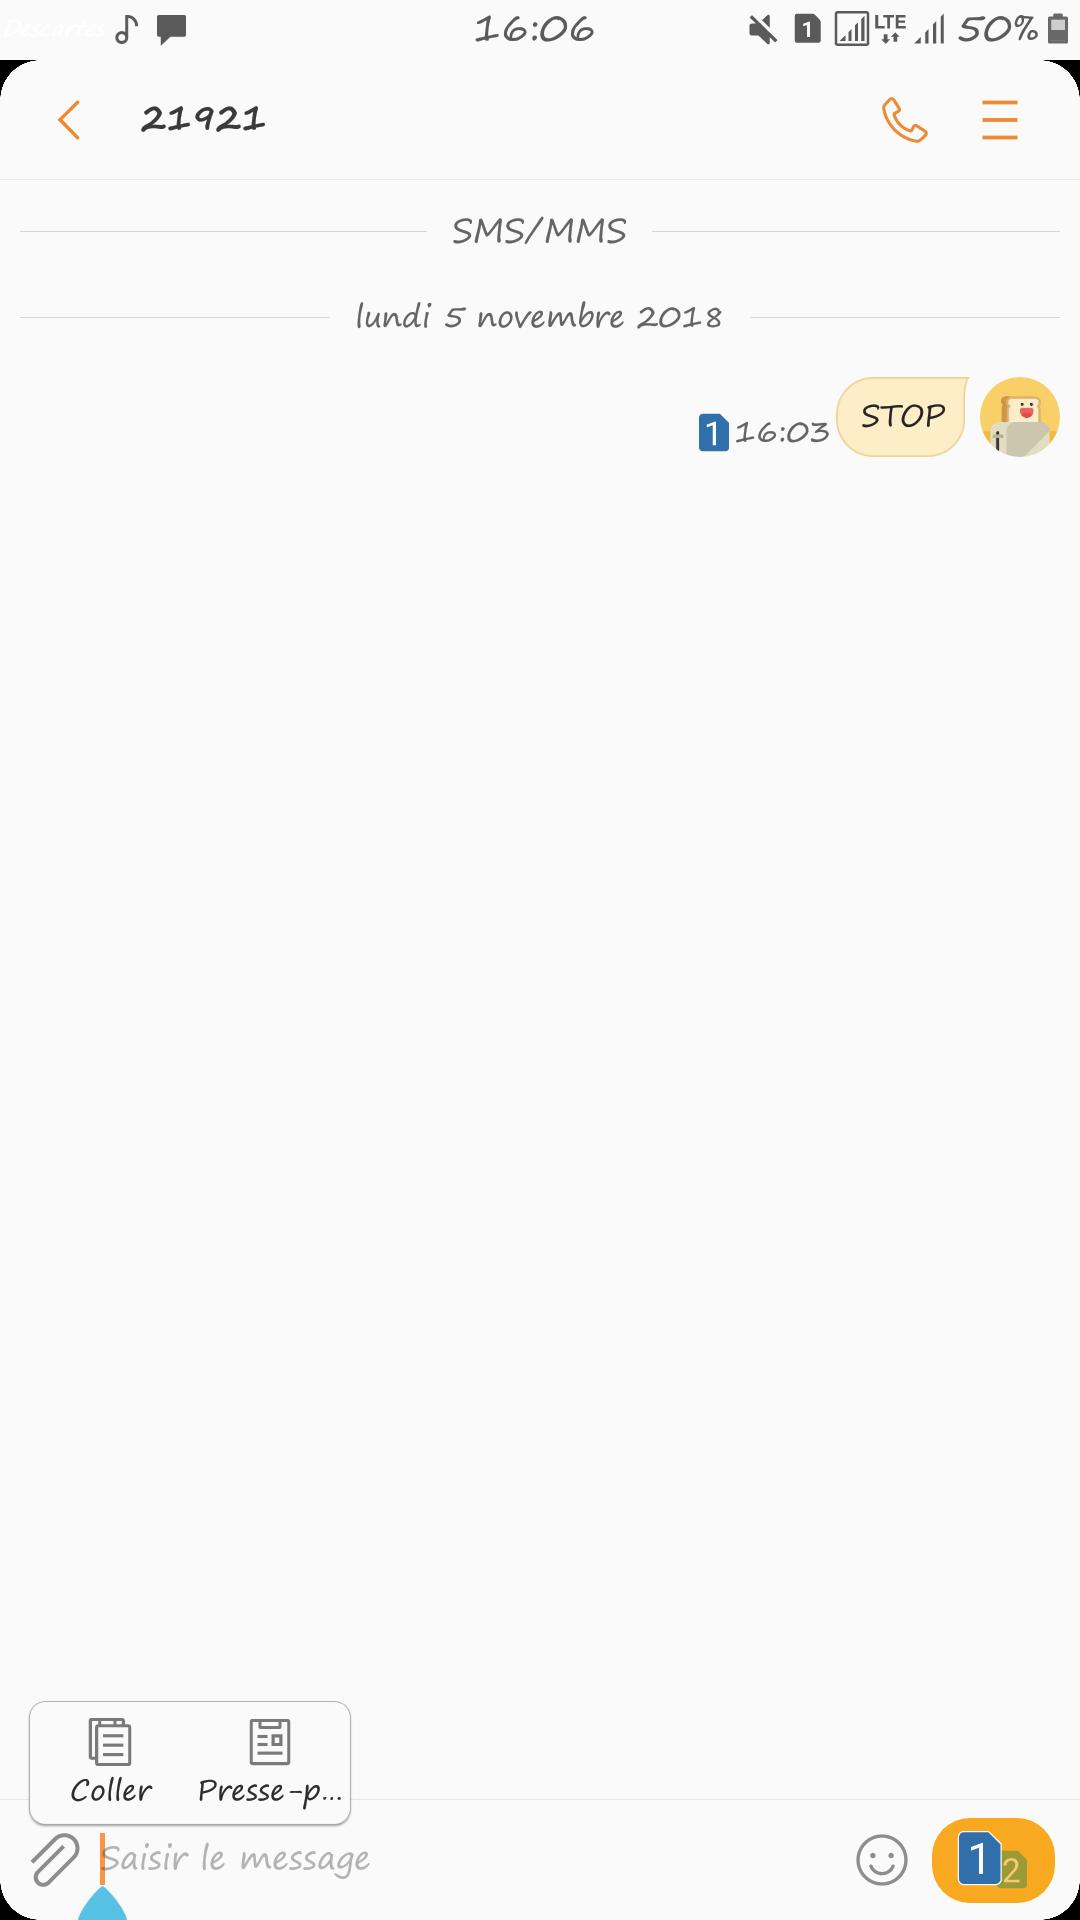 Screenshot_20181105-160612.png